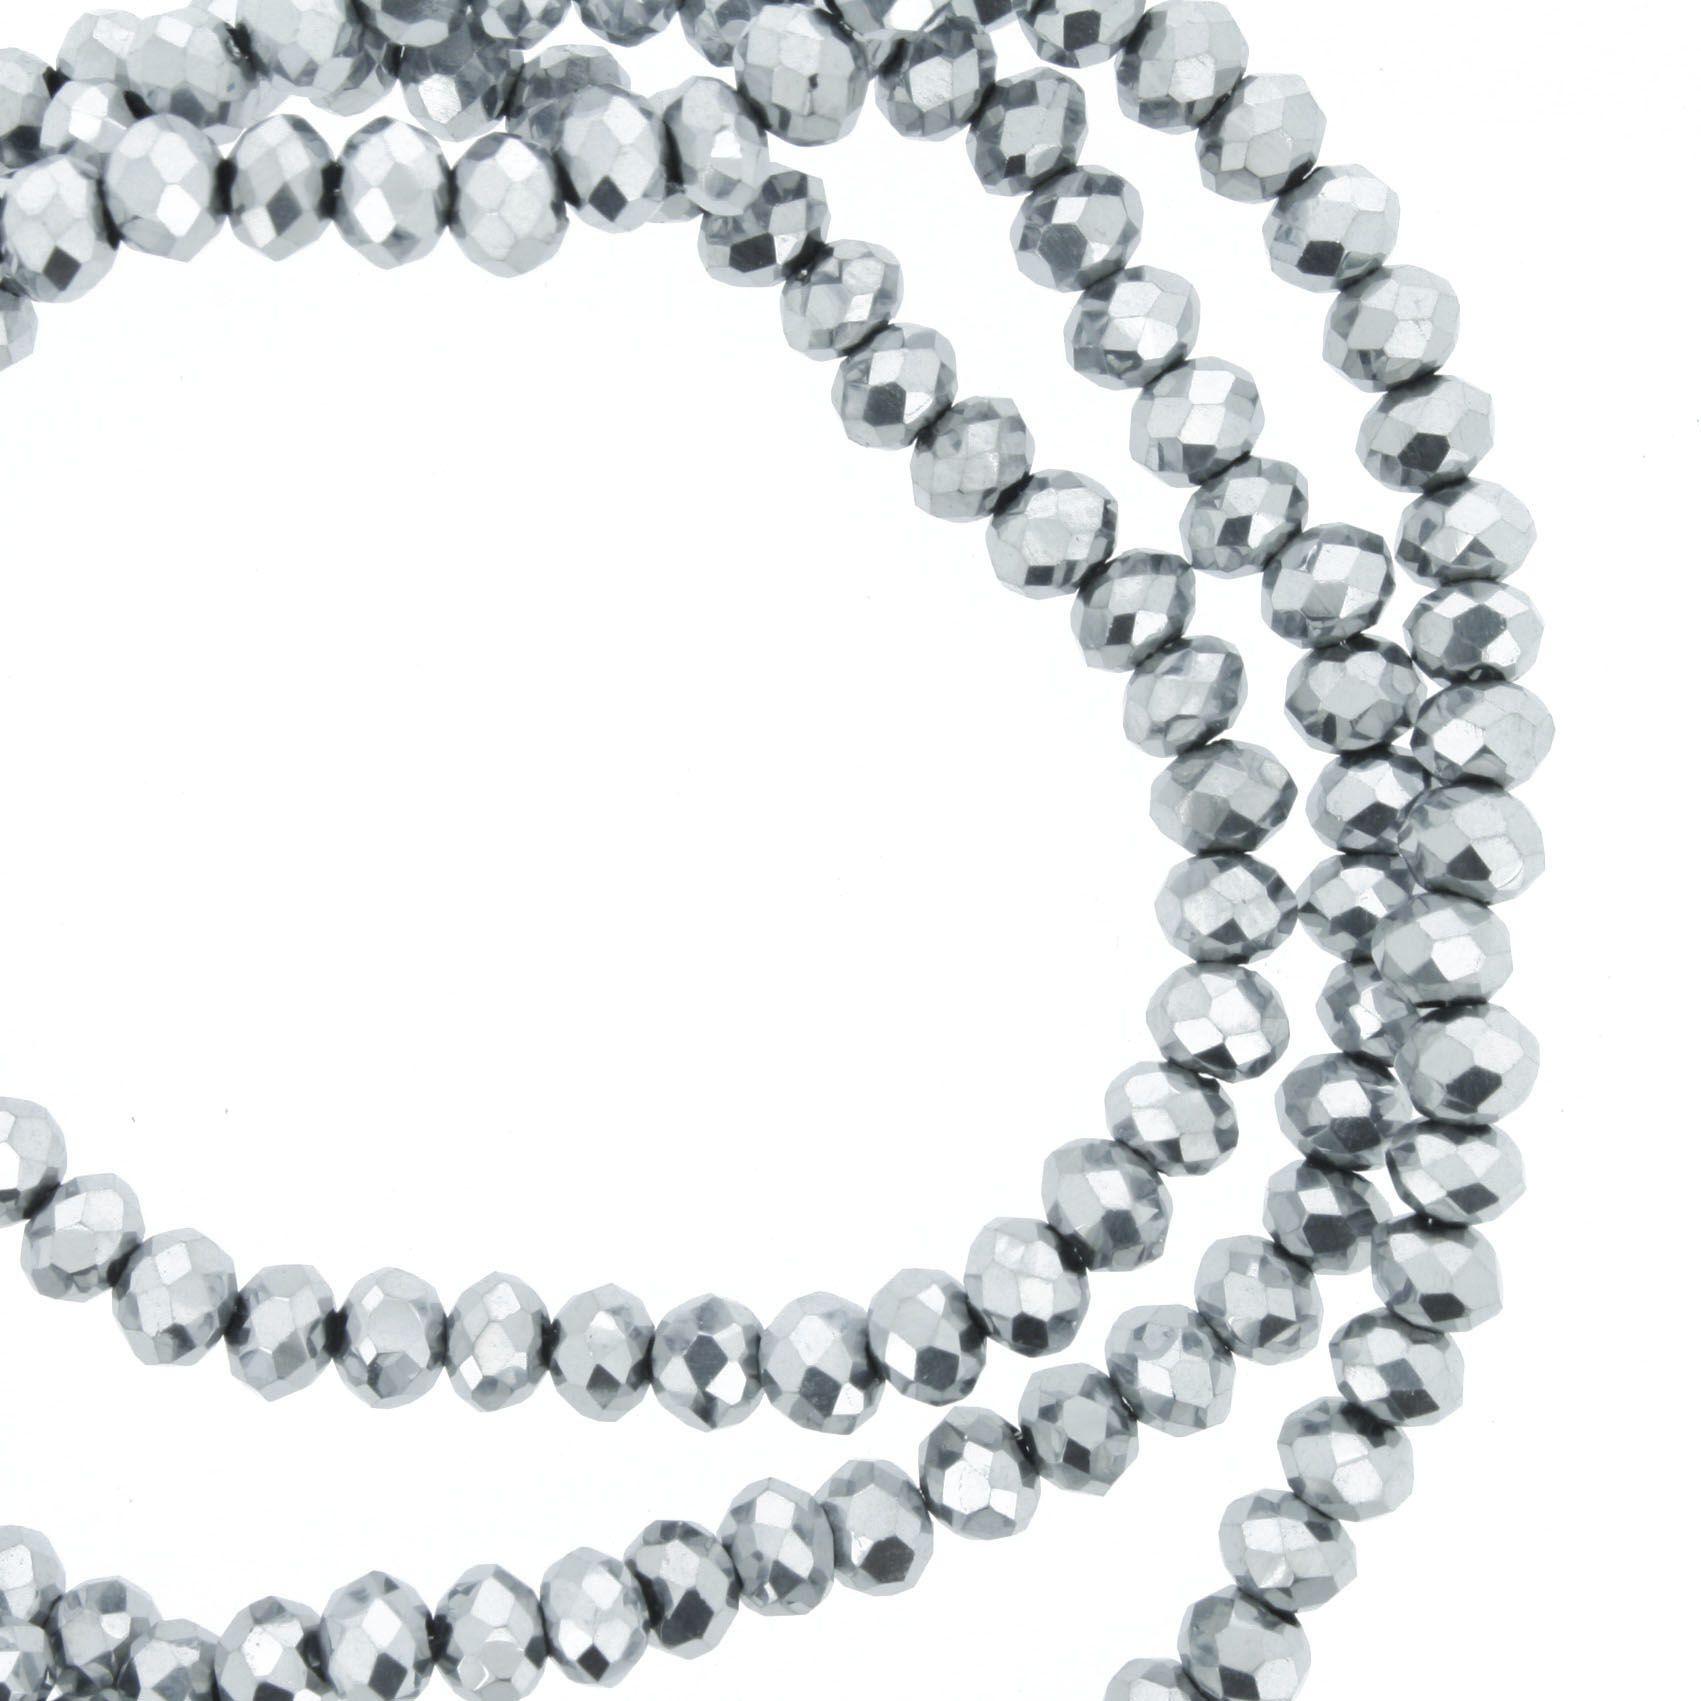 Fio de Cristal - Flat® - Prateado - 4mm  - Stéphanie Bijoux® - Peças para Bijuterias e Artesanato